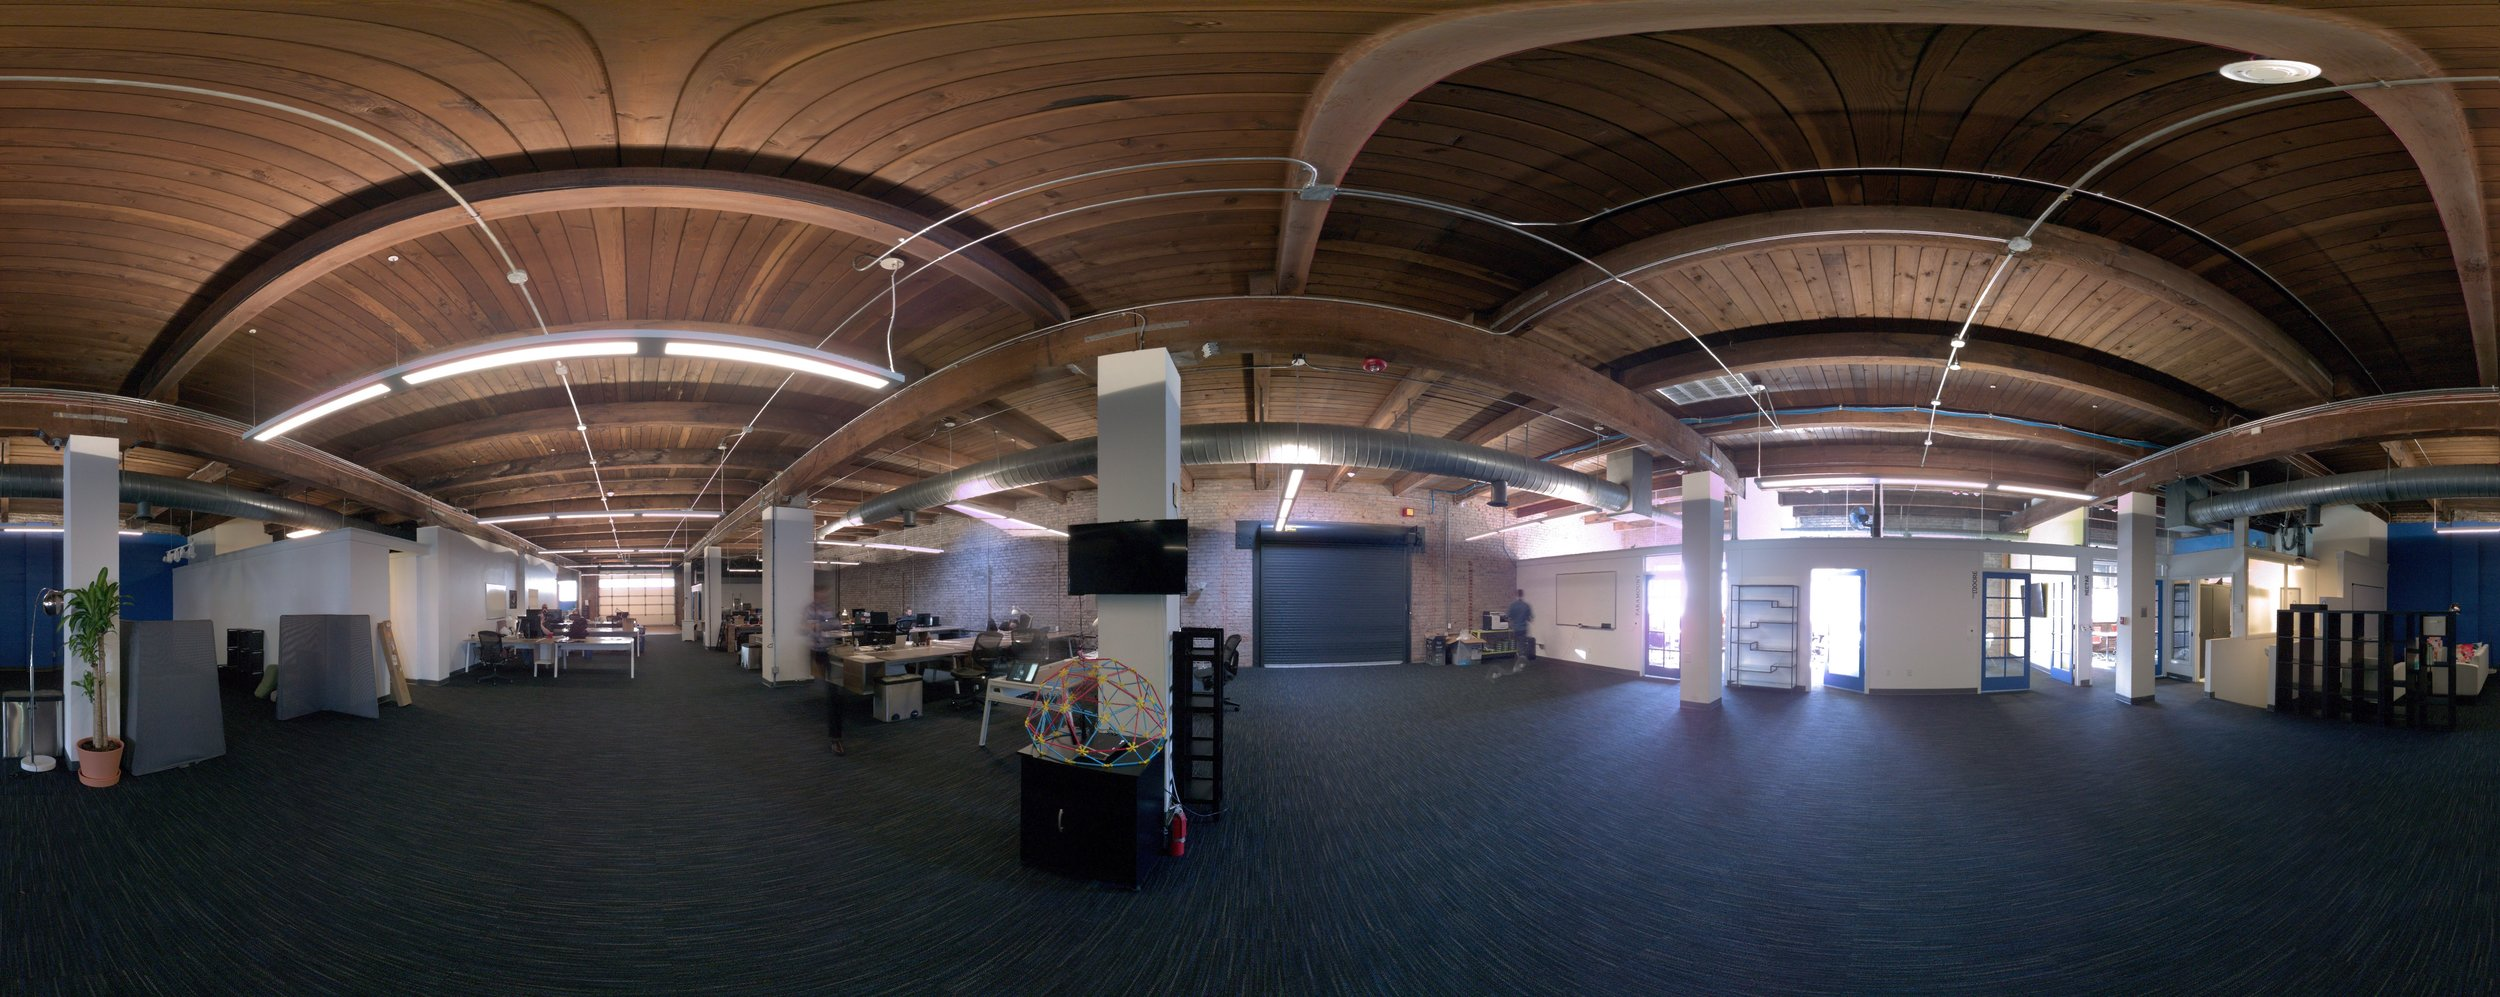 FM Panorama Office Shot.jpg